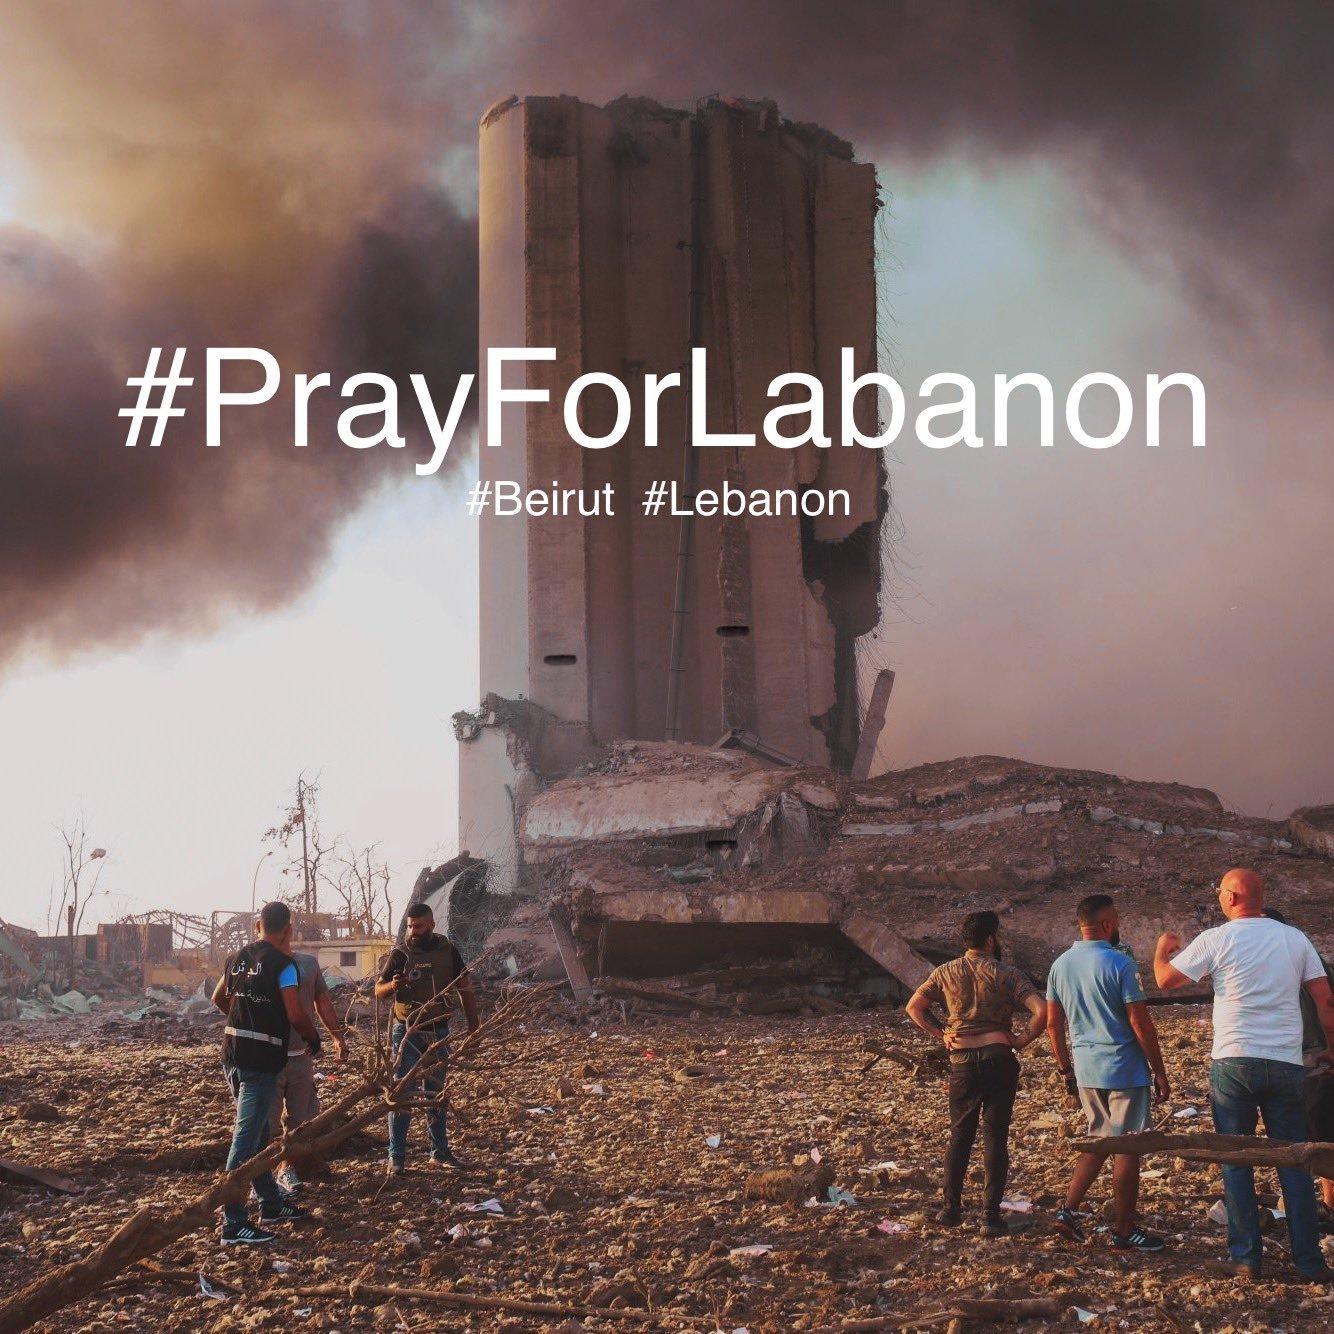 Mirip Bom, Ledakan Terbesar Sepanjang Sejarah Lebanon BEKASIMEDIA.COM | MEDIA BEKASI SEJAK 2014